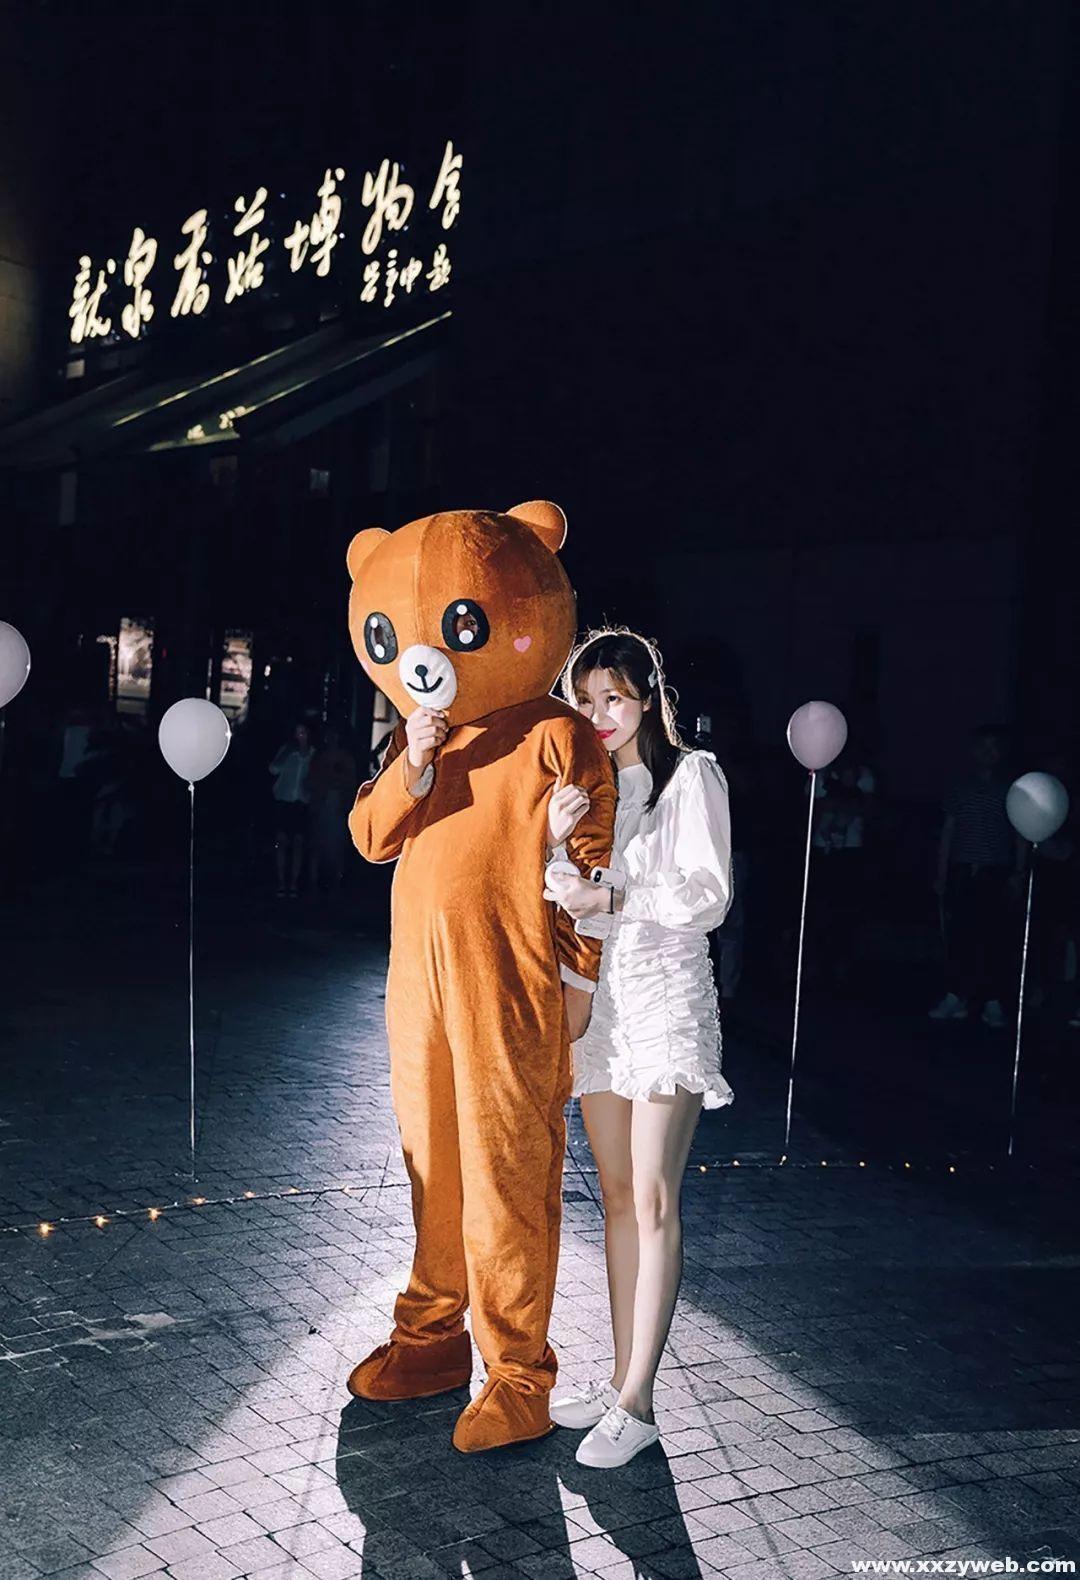 MG STUDIO出品 | 乐乐&扬扬---龙泉博物馆求婚视频